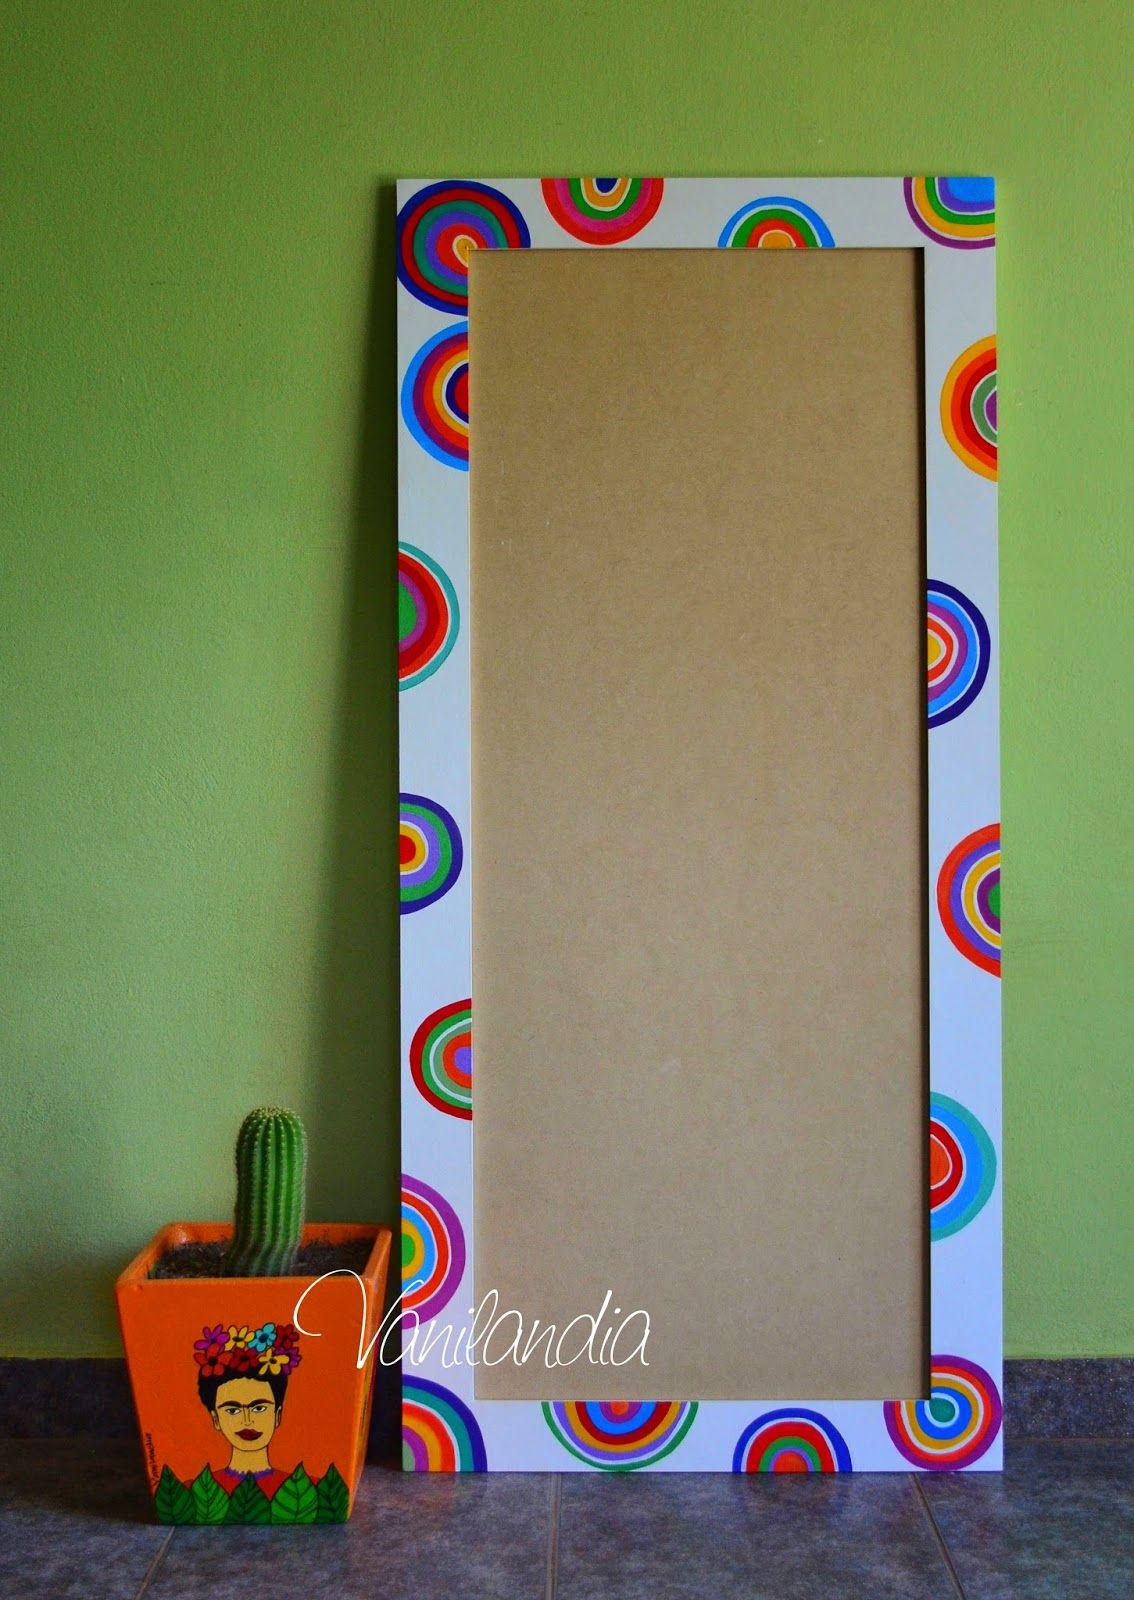 Pin de Dominga Valverde Franzani en Ideas Creativas | Pinterest ...